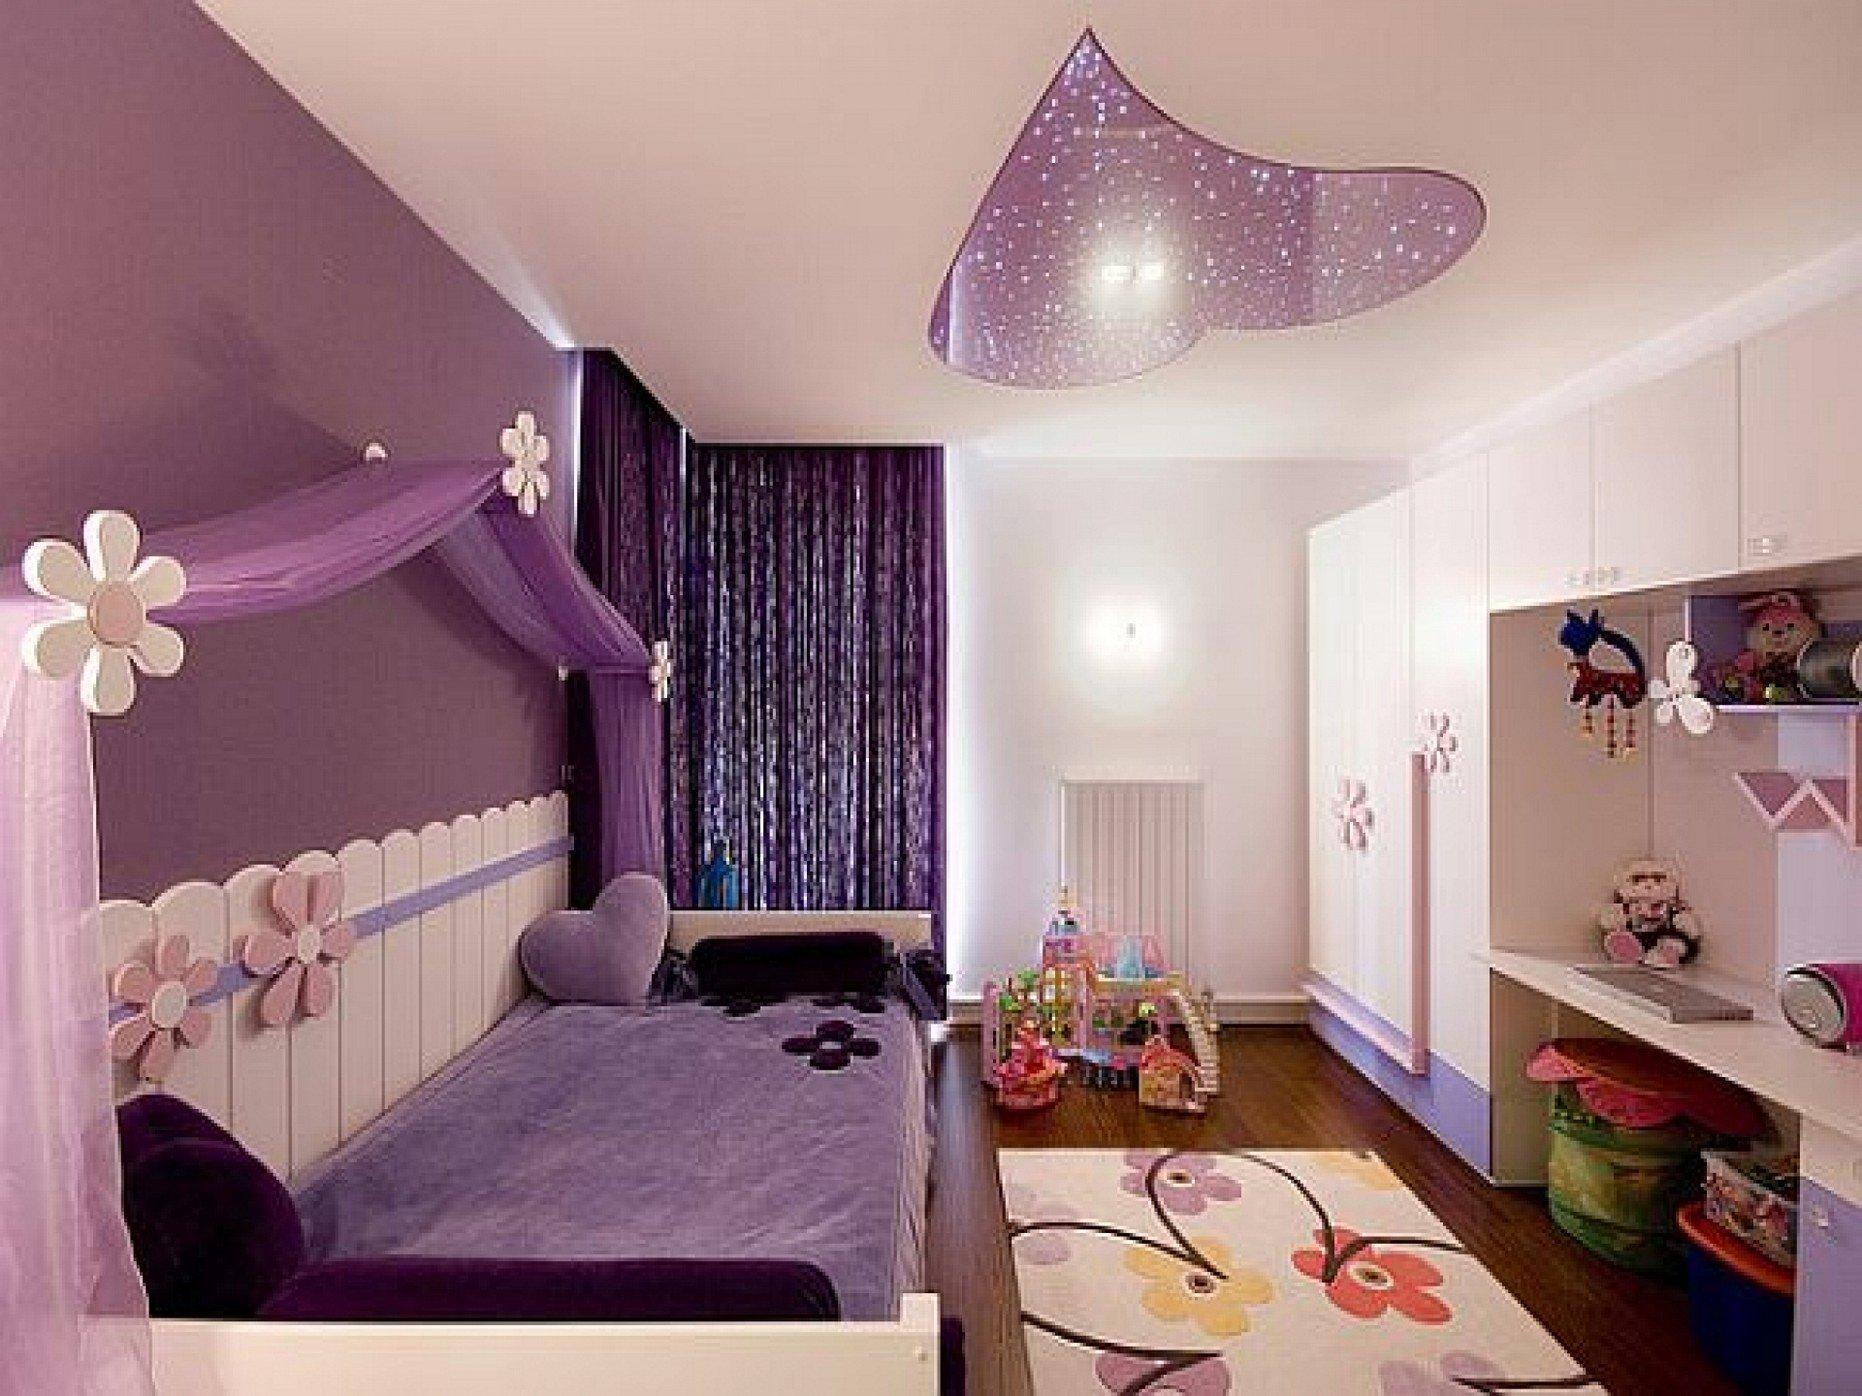 10 Great Do It Yourself Bedroom Ideas diy bedroom decorating ideas 2021